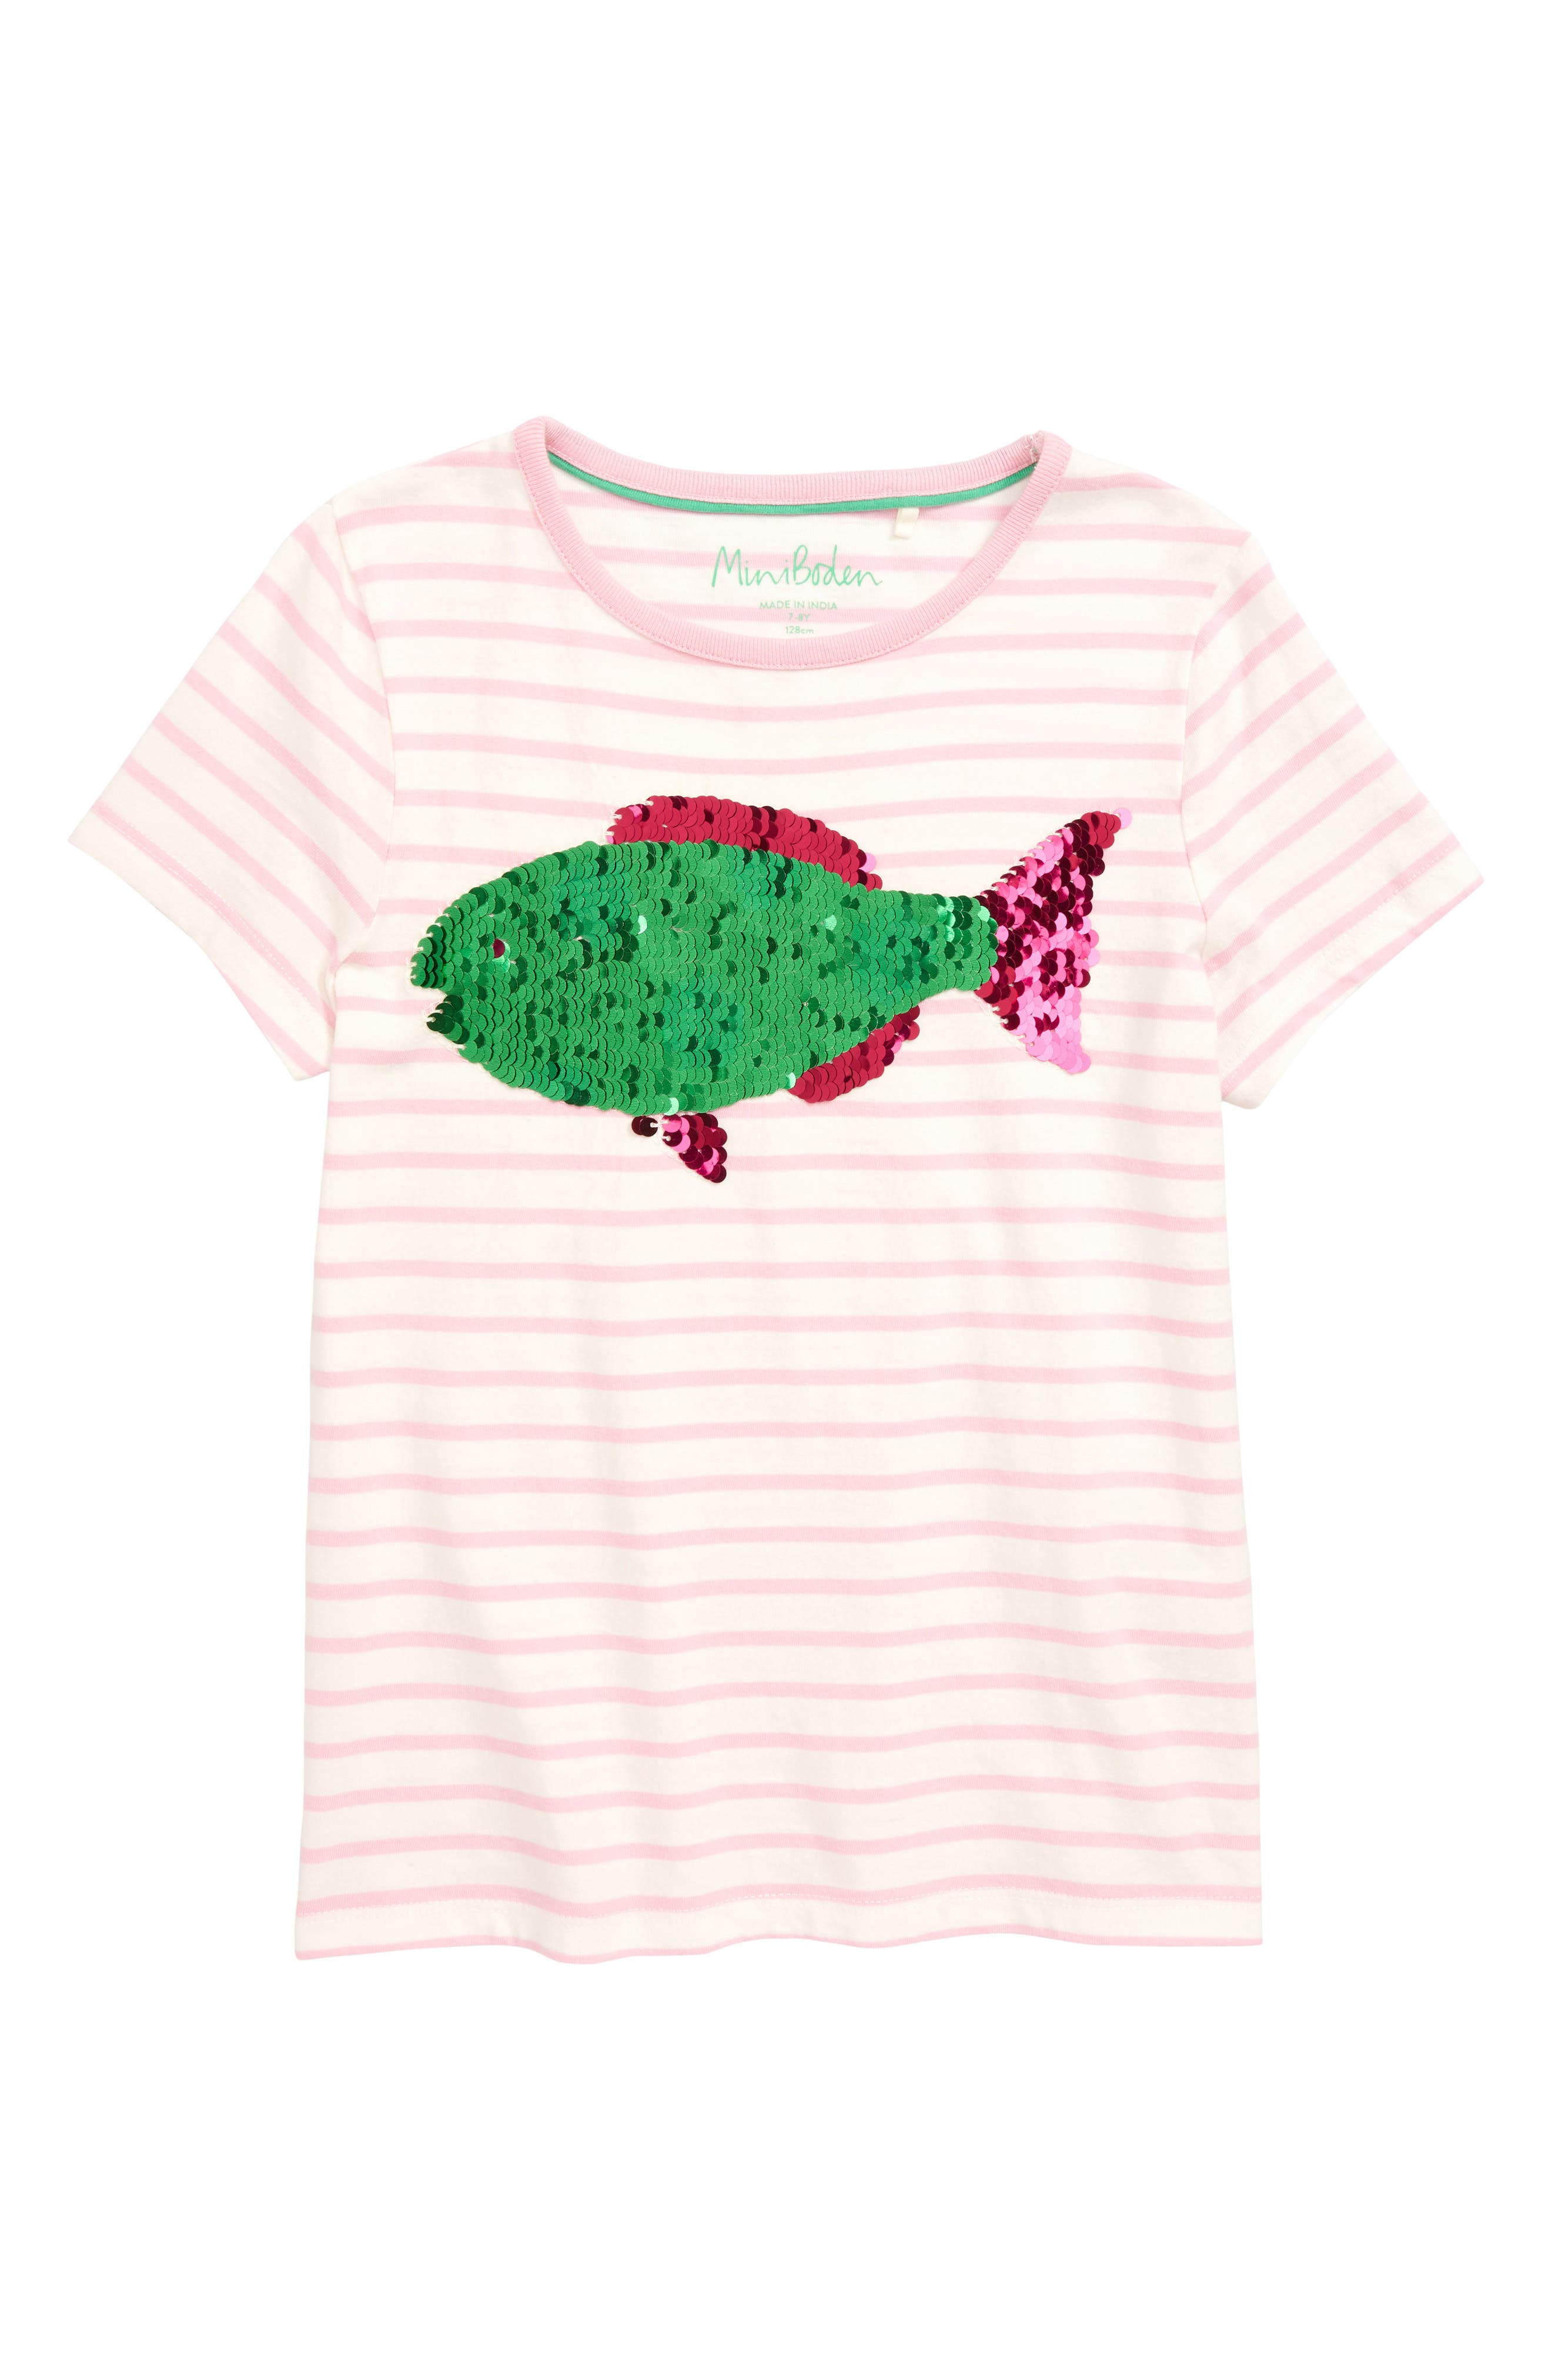 Sunny Color Change Tee,                             Main thumbnail 1, color,                             Ivory/ Rosebud Pink Fish